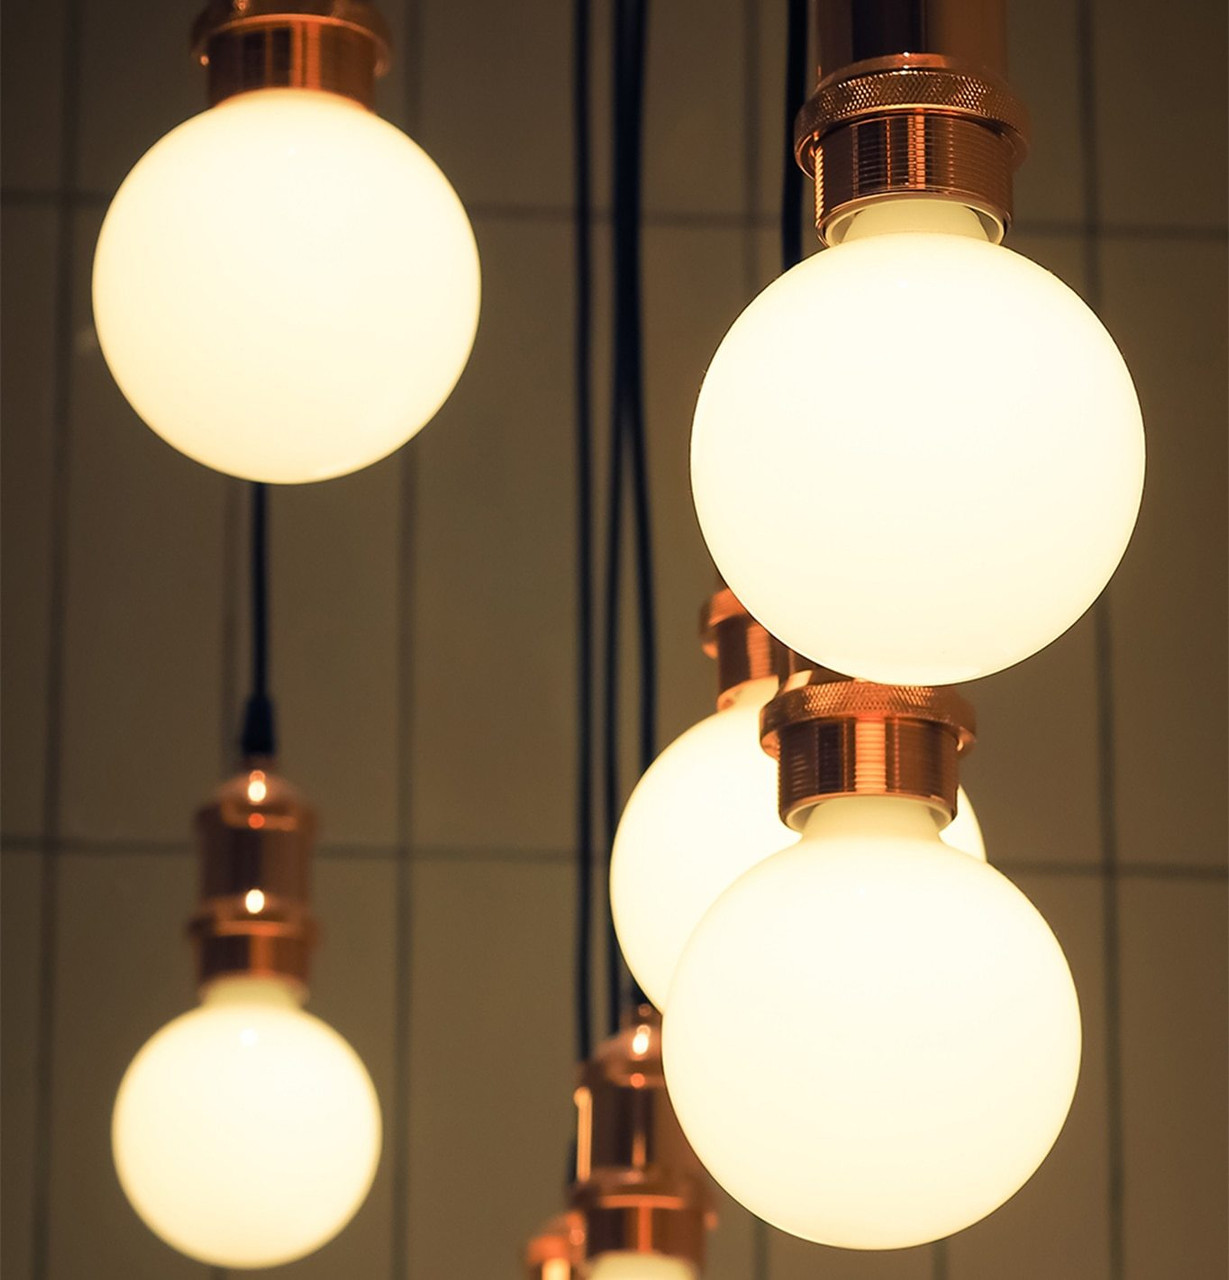 LED Dimmable G95 Screw Light Bulbs